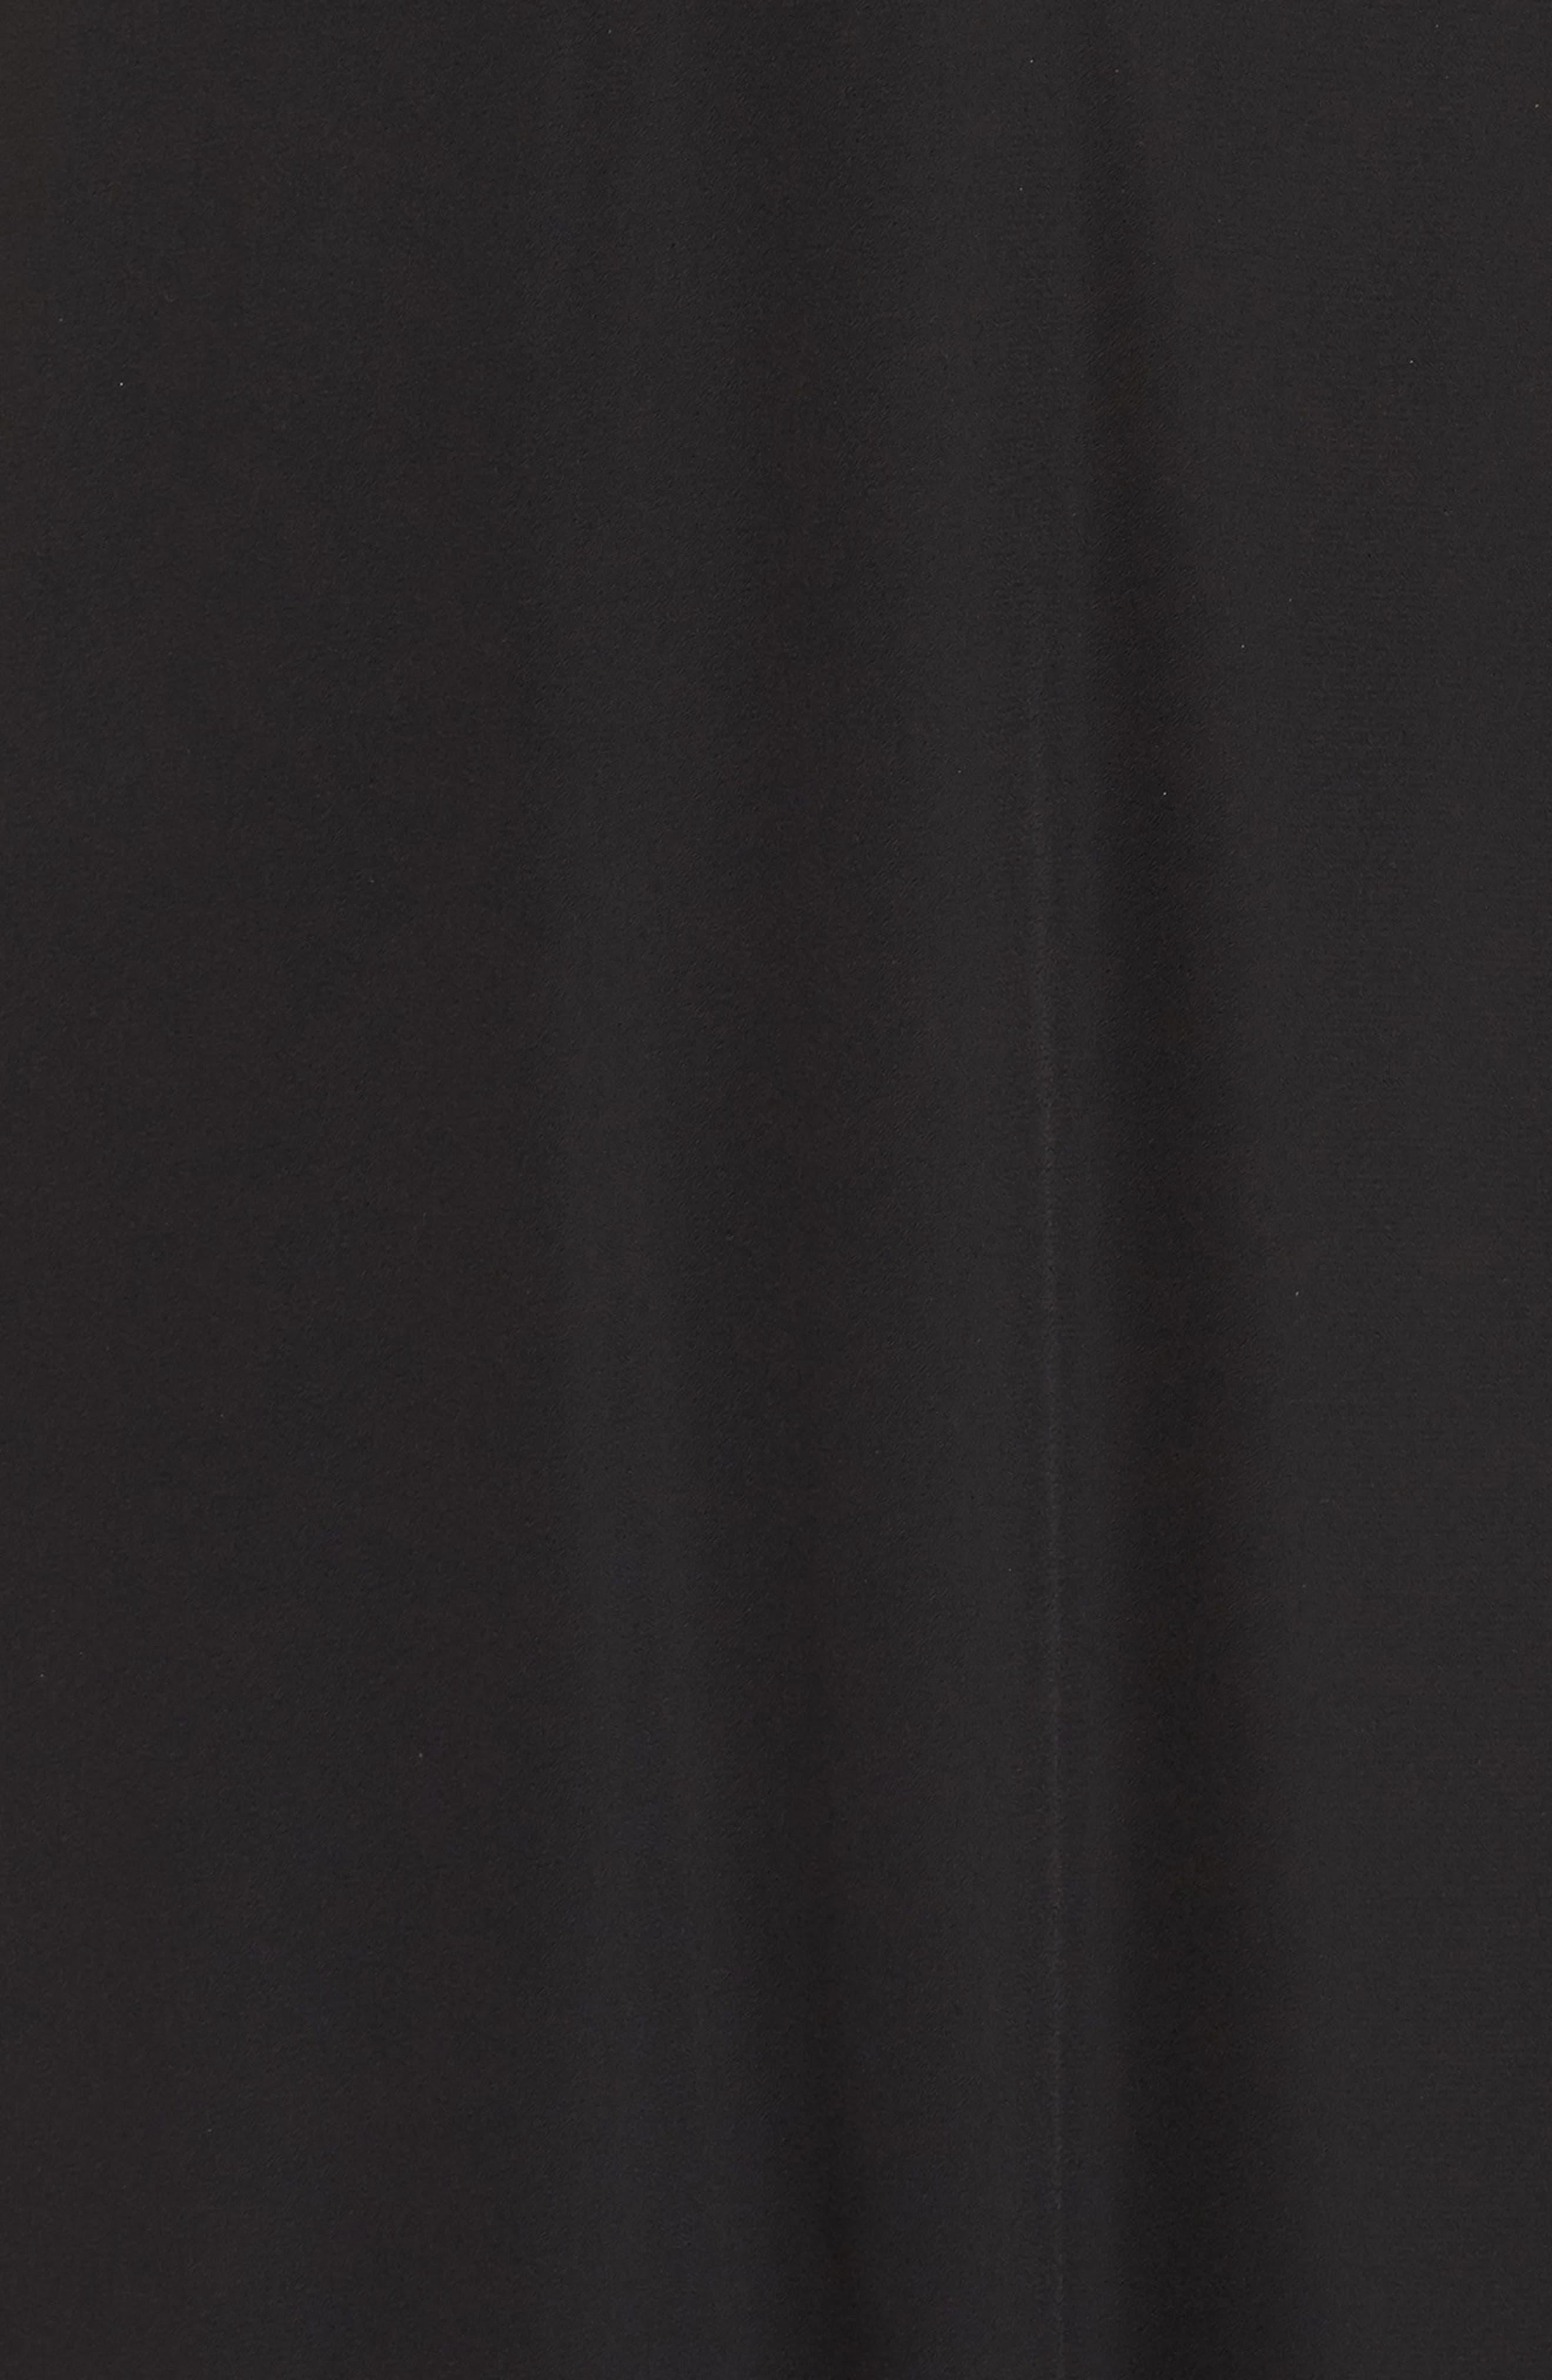 Halter A-Line Chiffon Gown,                             Alternate thumbnail 5, color,                             001